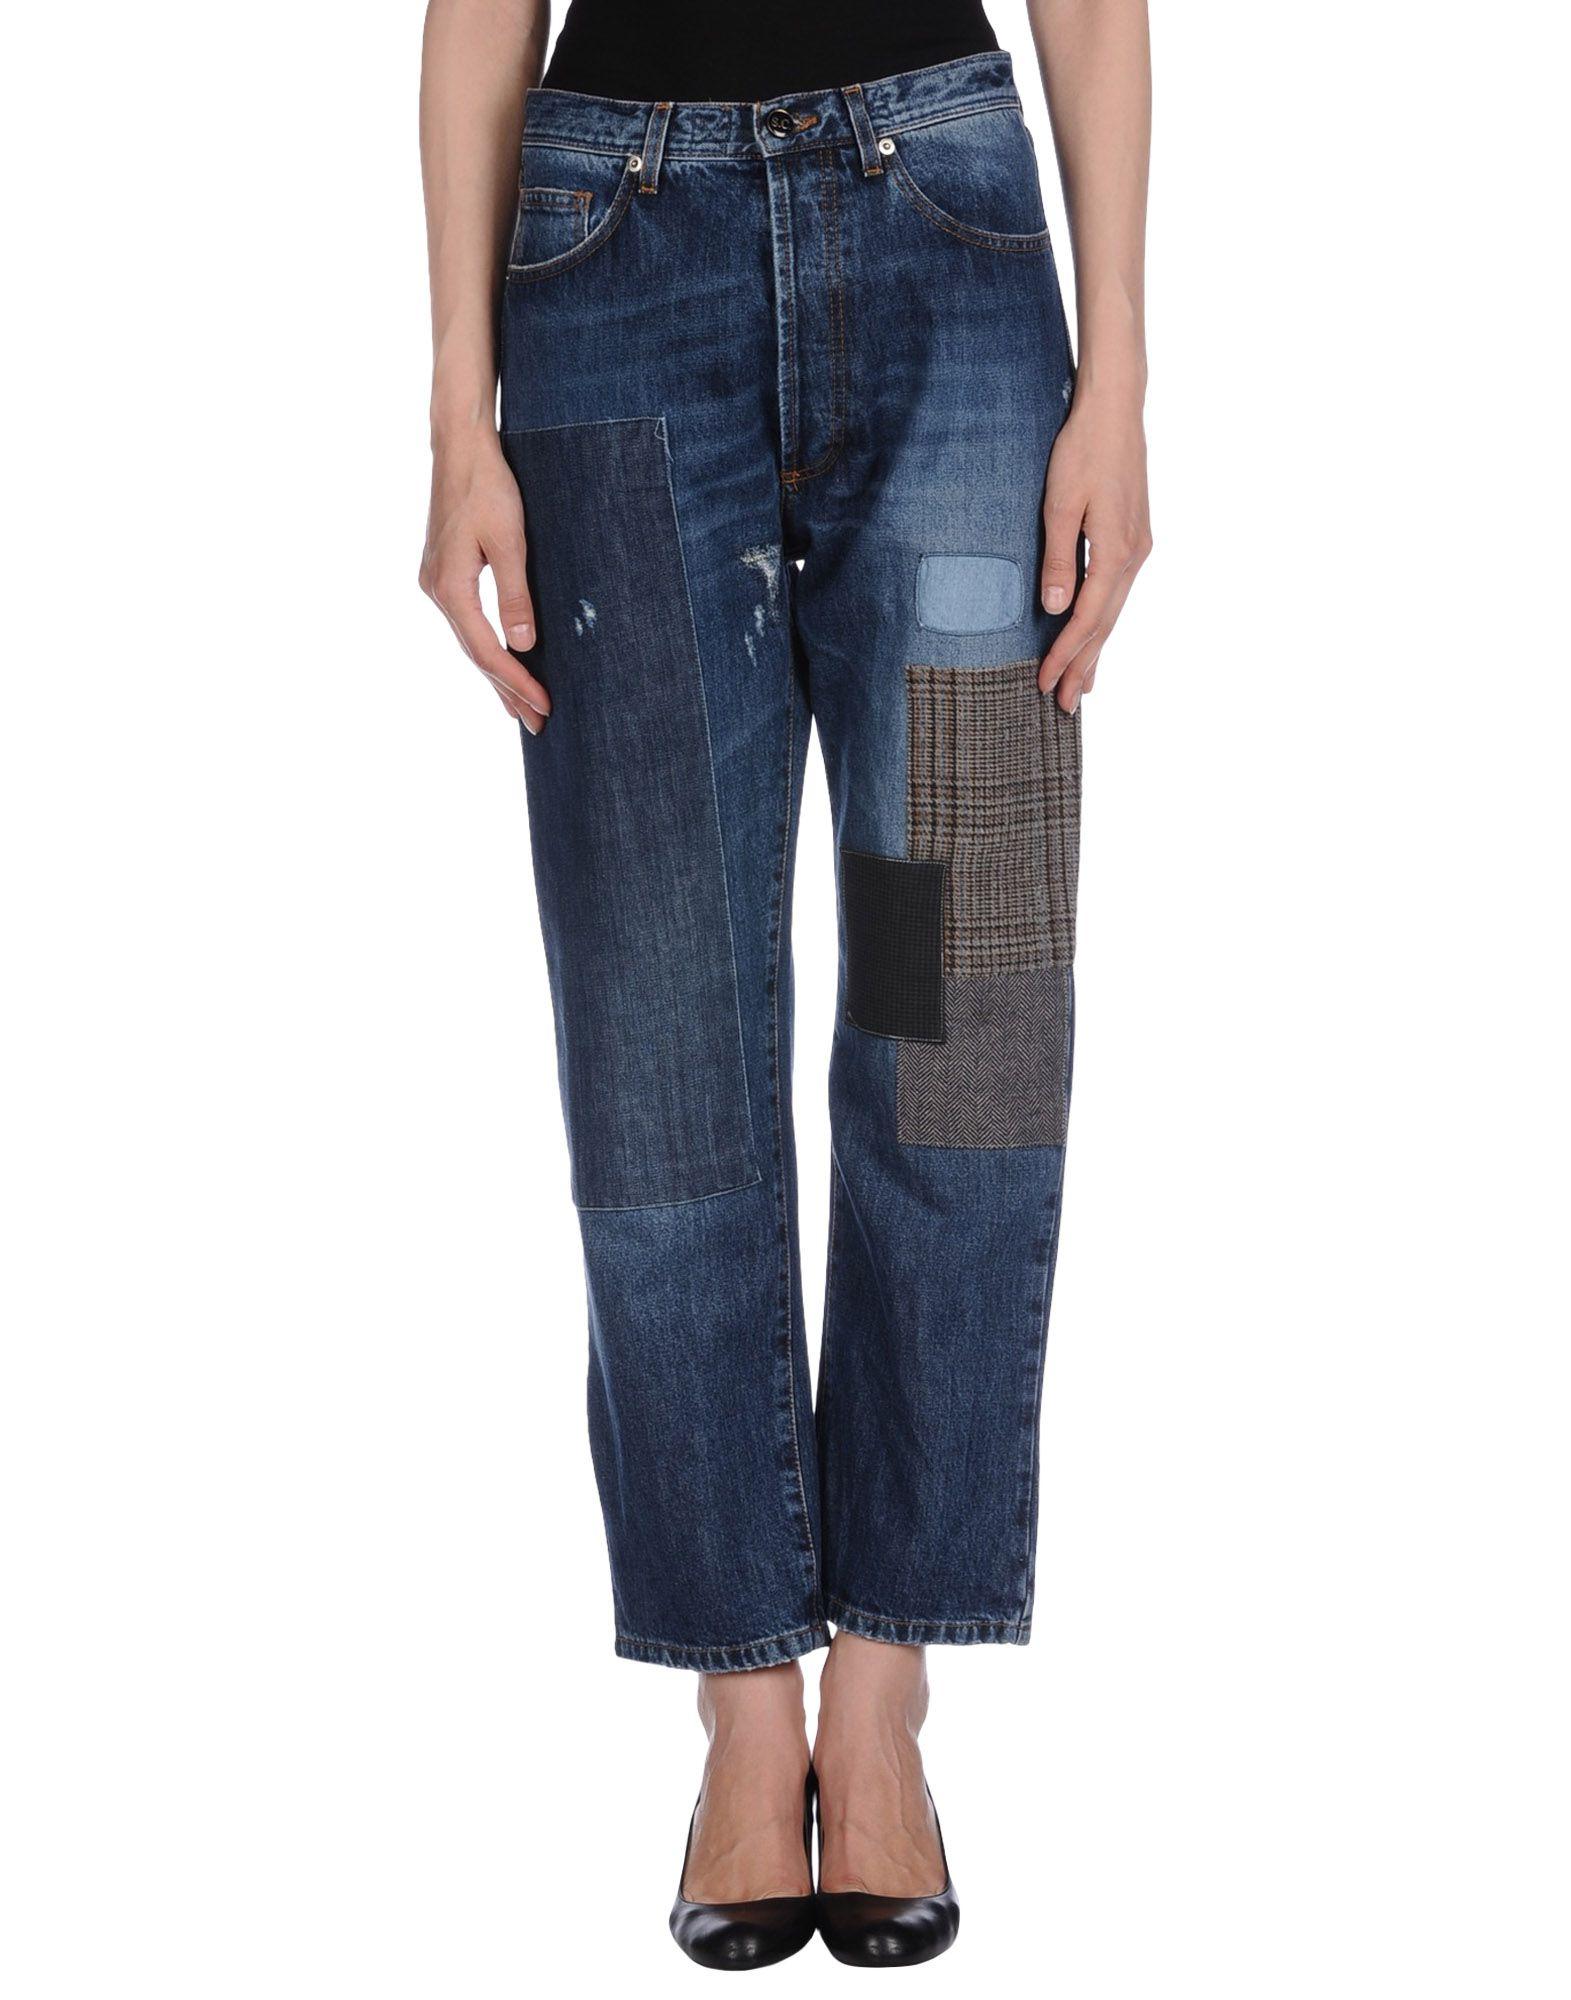 DENIM - Denim trousers Semicouture Footlocker Sale Online vohde